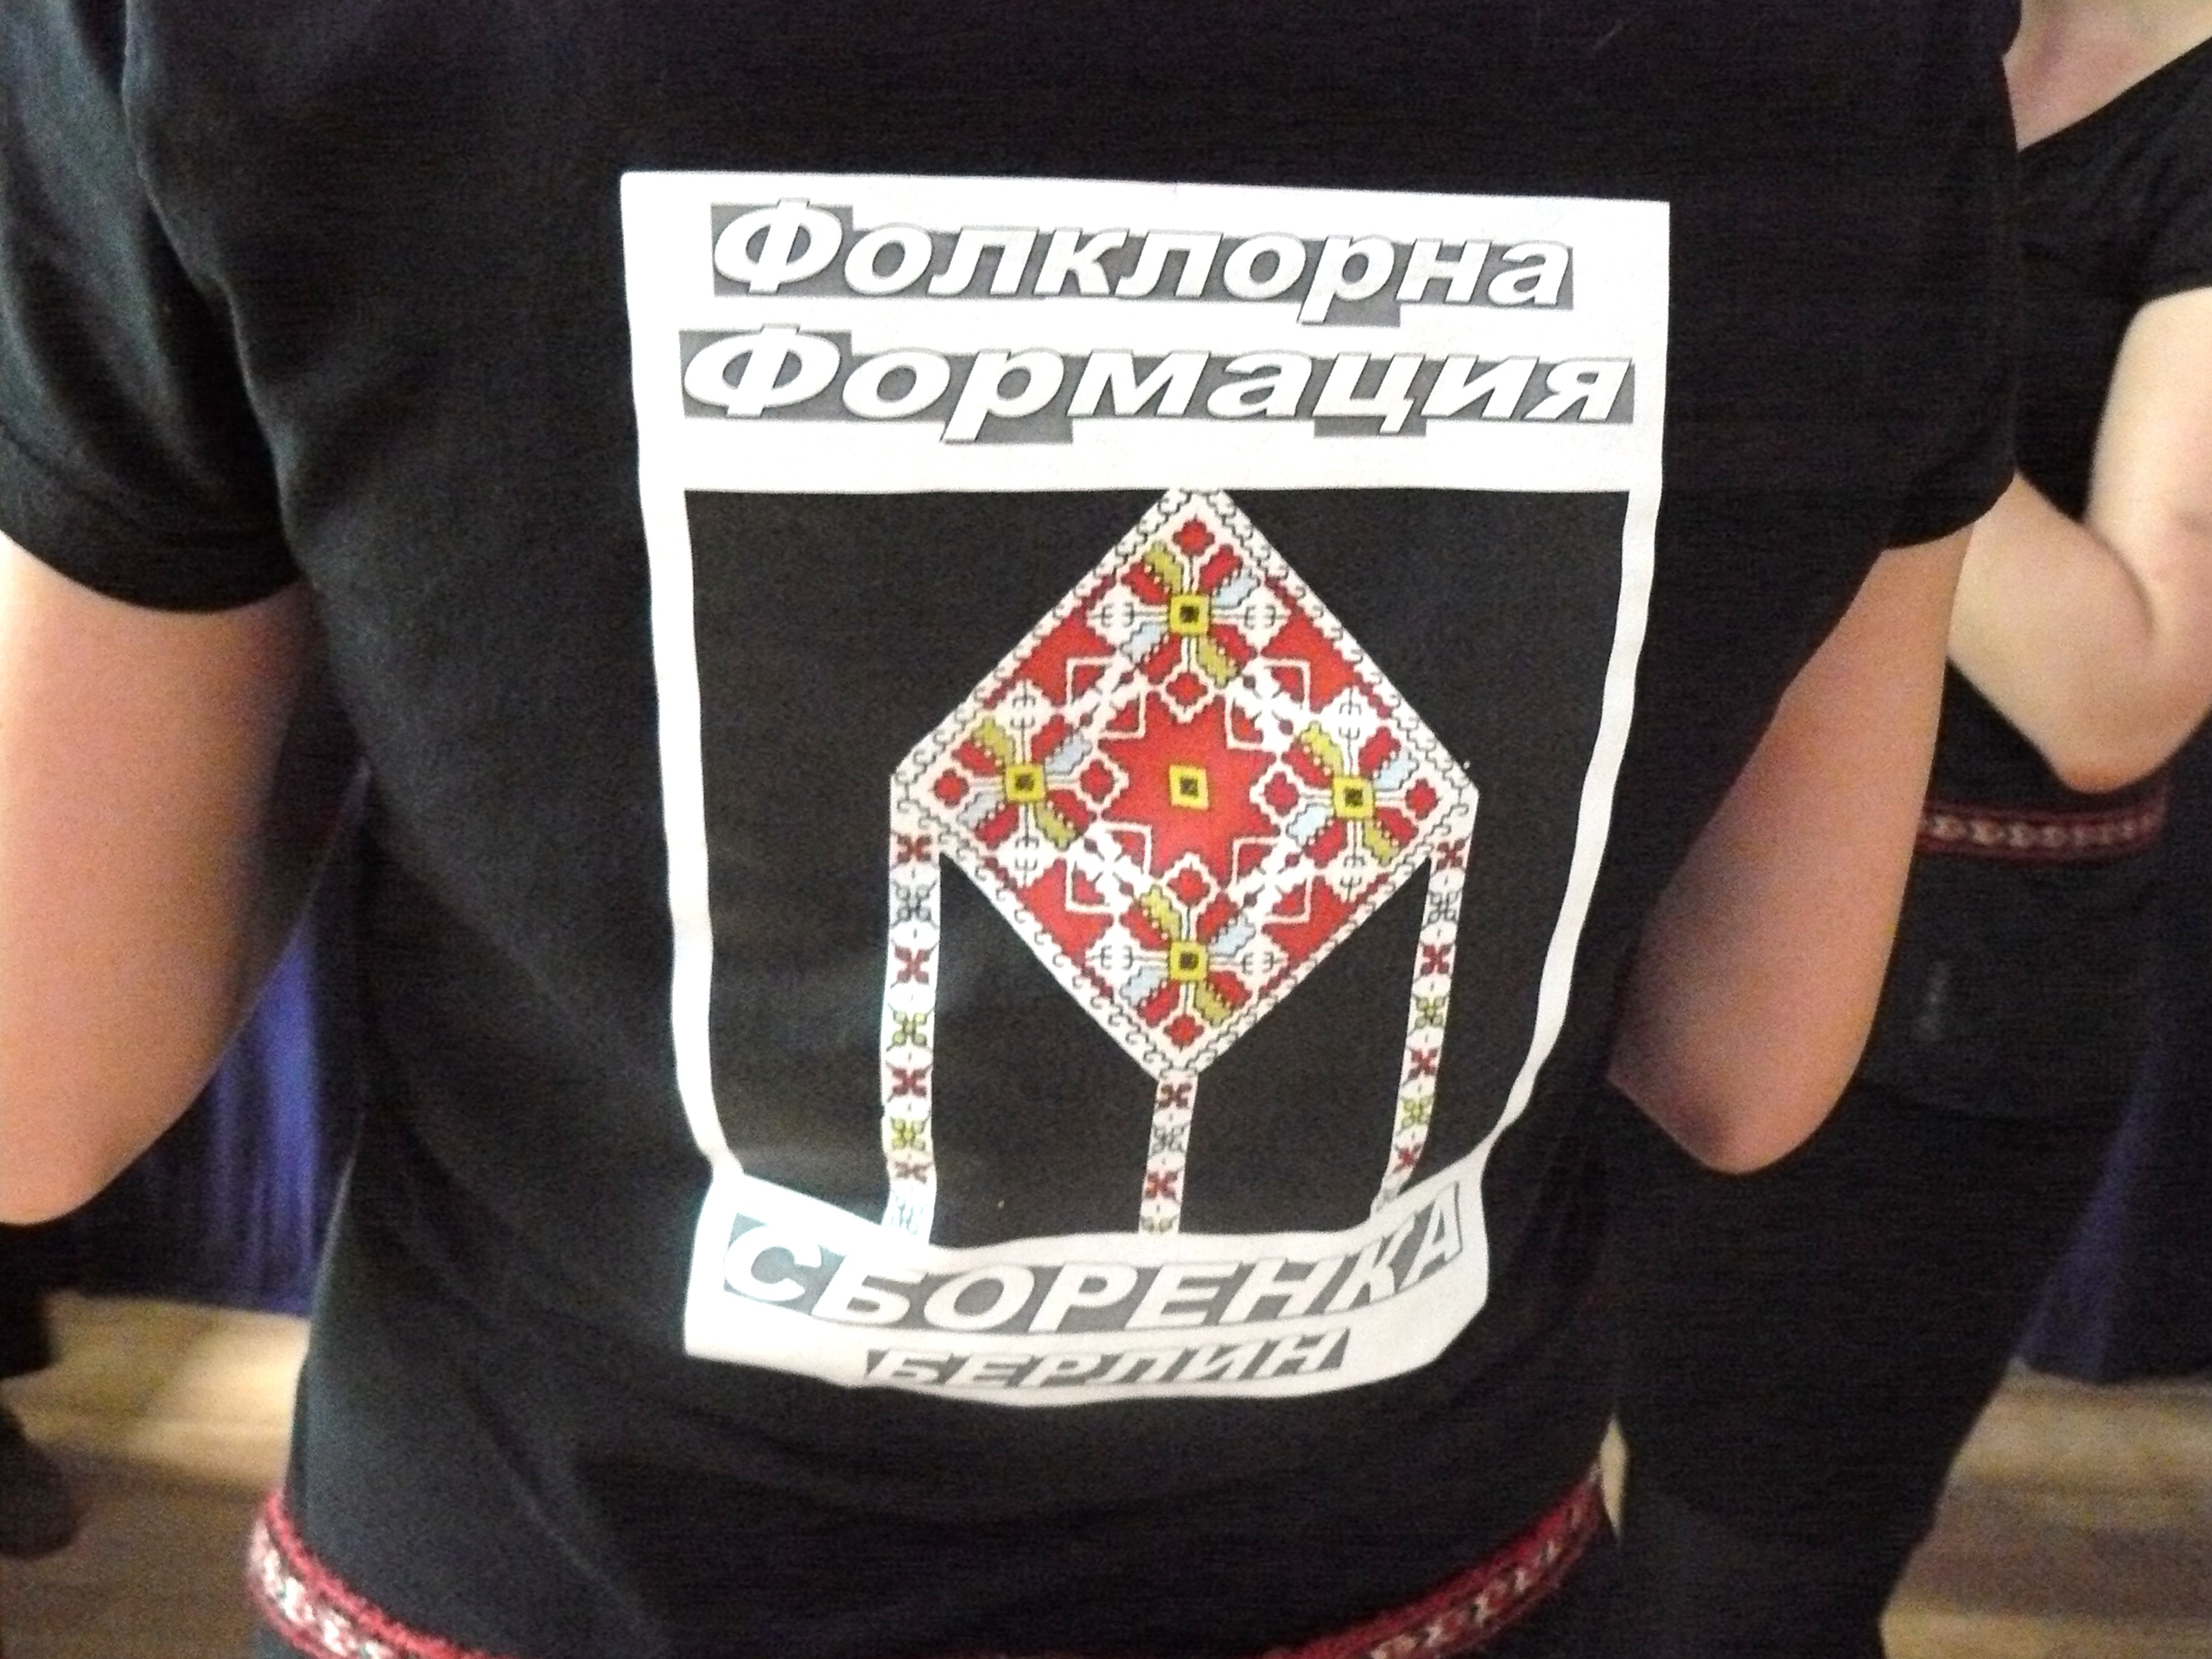 "Фолклорна формация ""Сборенка"" – Берлин"